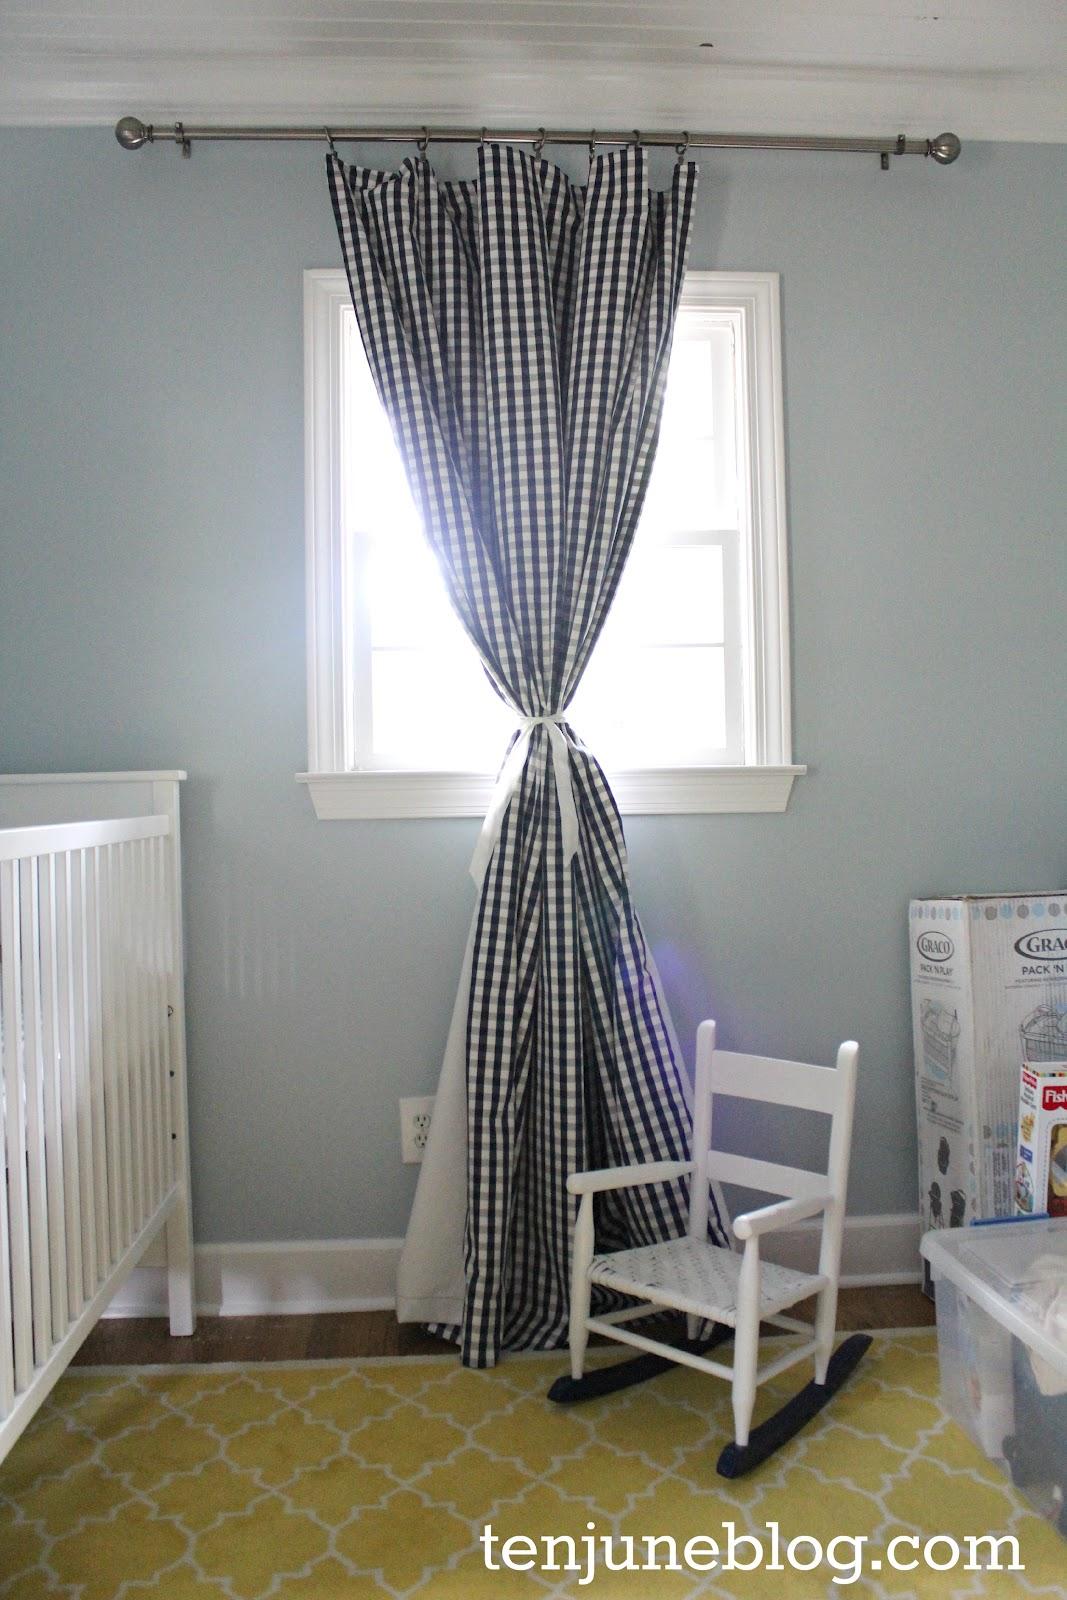 Ten June Diy Blackout Curtain Tutorial How To Make